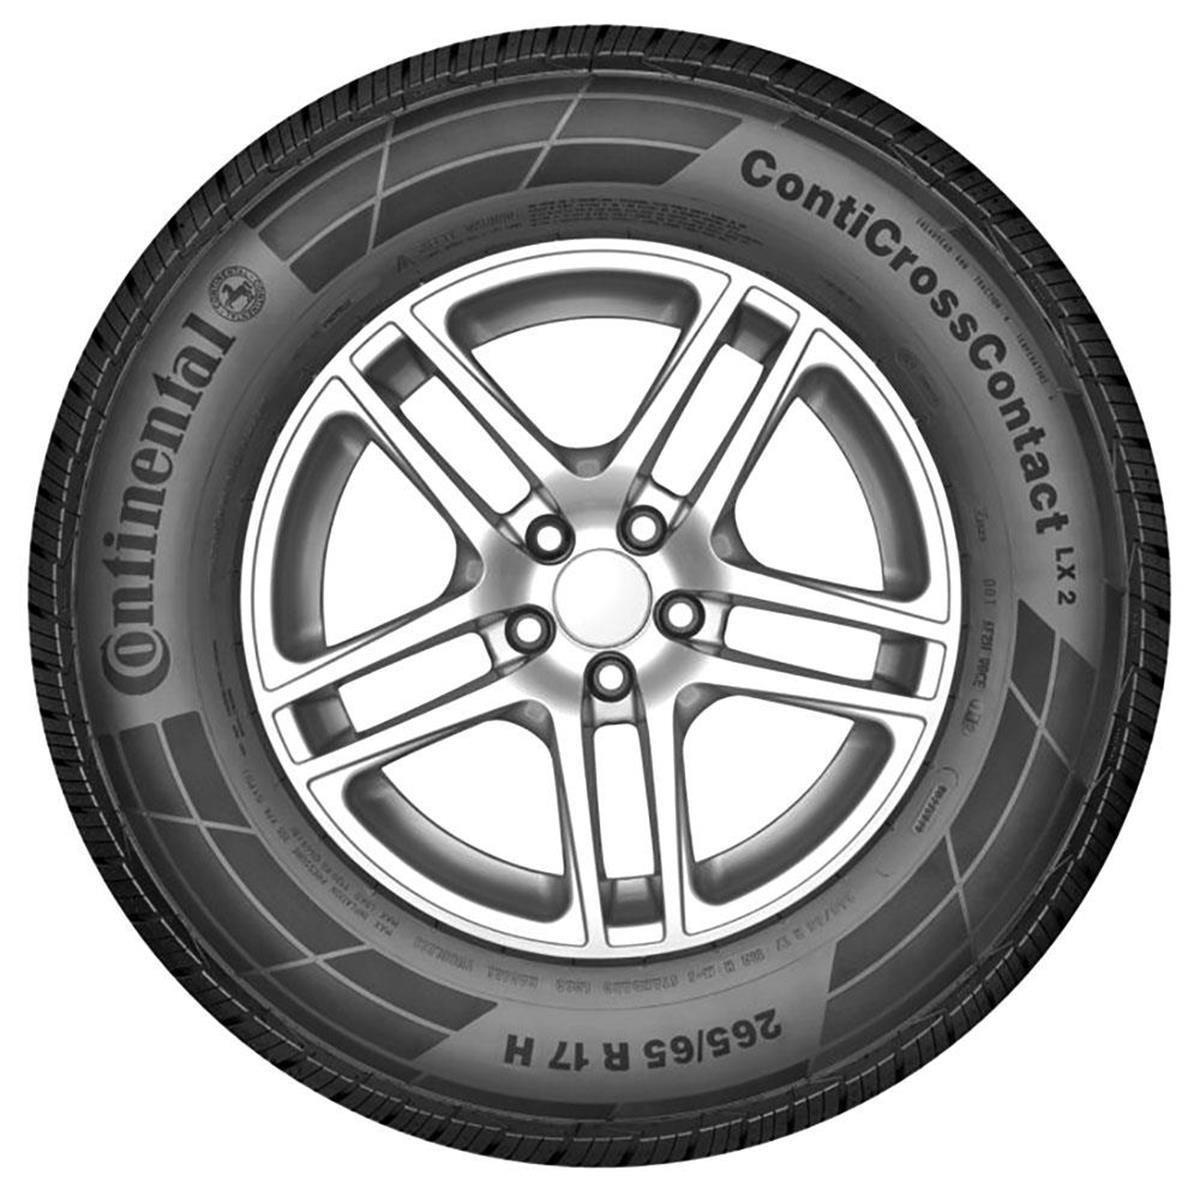 Pneu Continental 265/40R22 106Y XL FR CrossContact LX Sport J LR